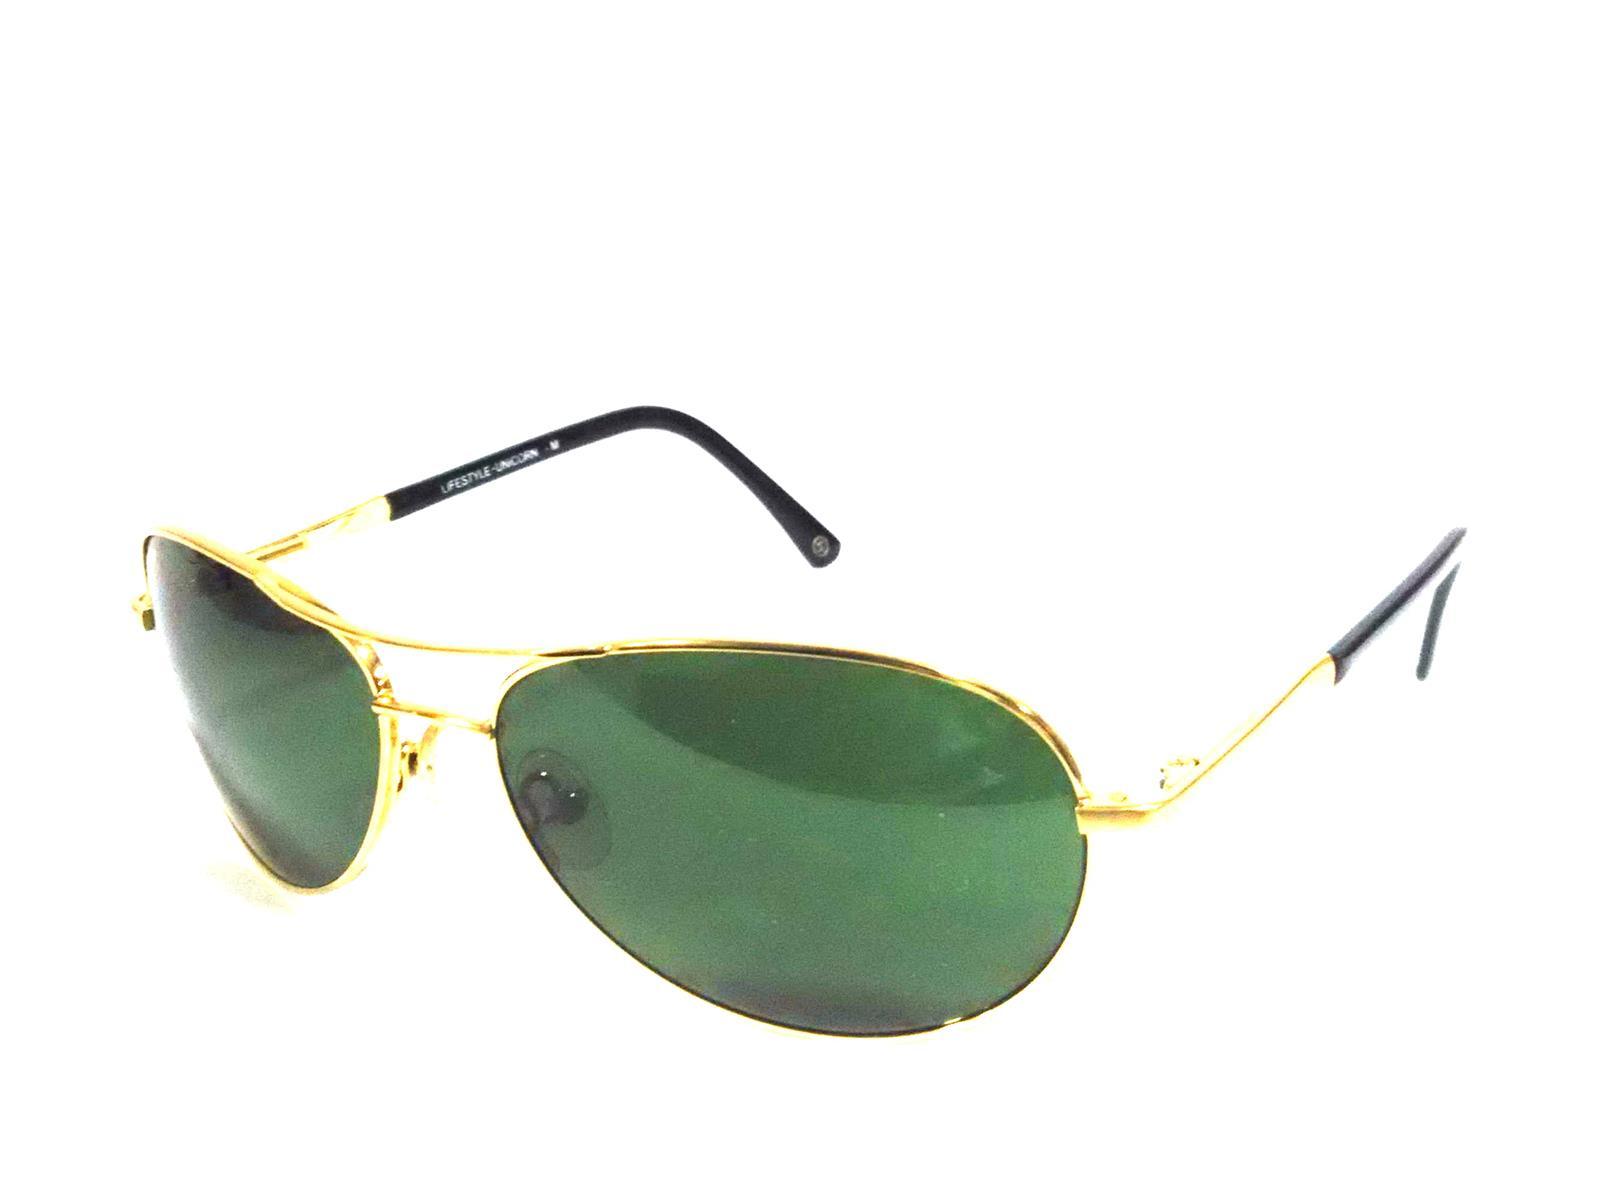 Aviator Sunglasses for Oval Face